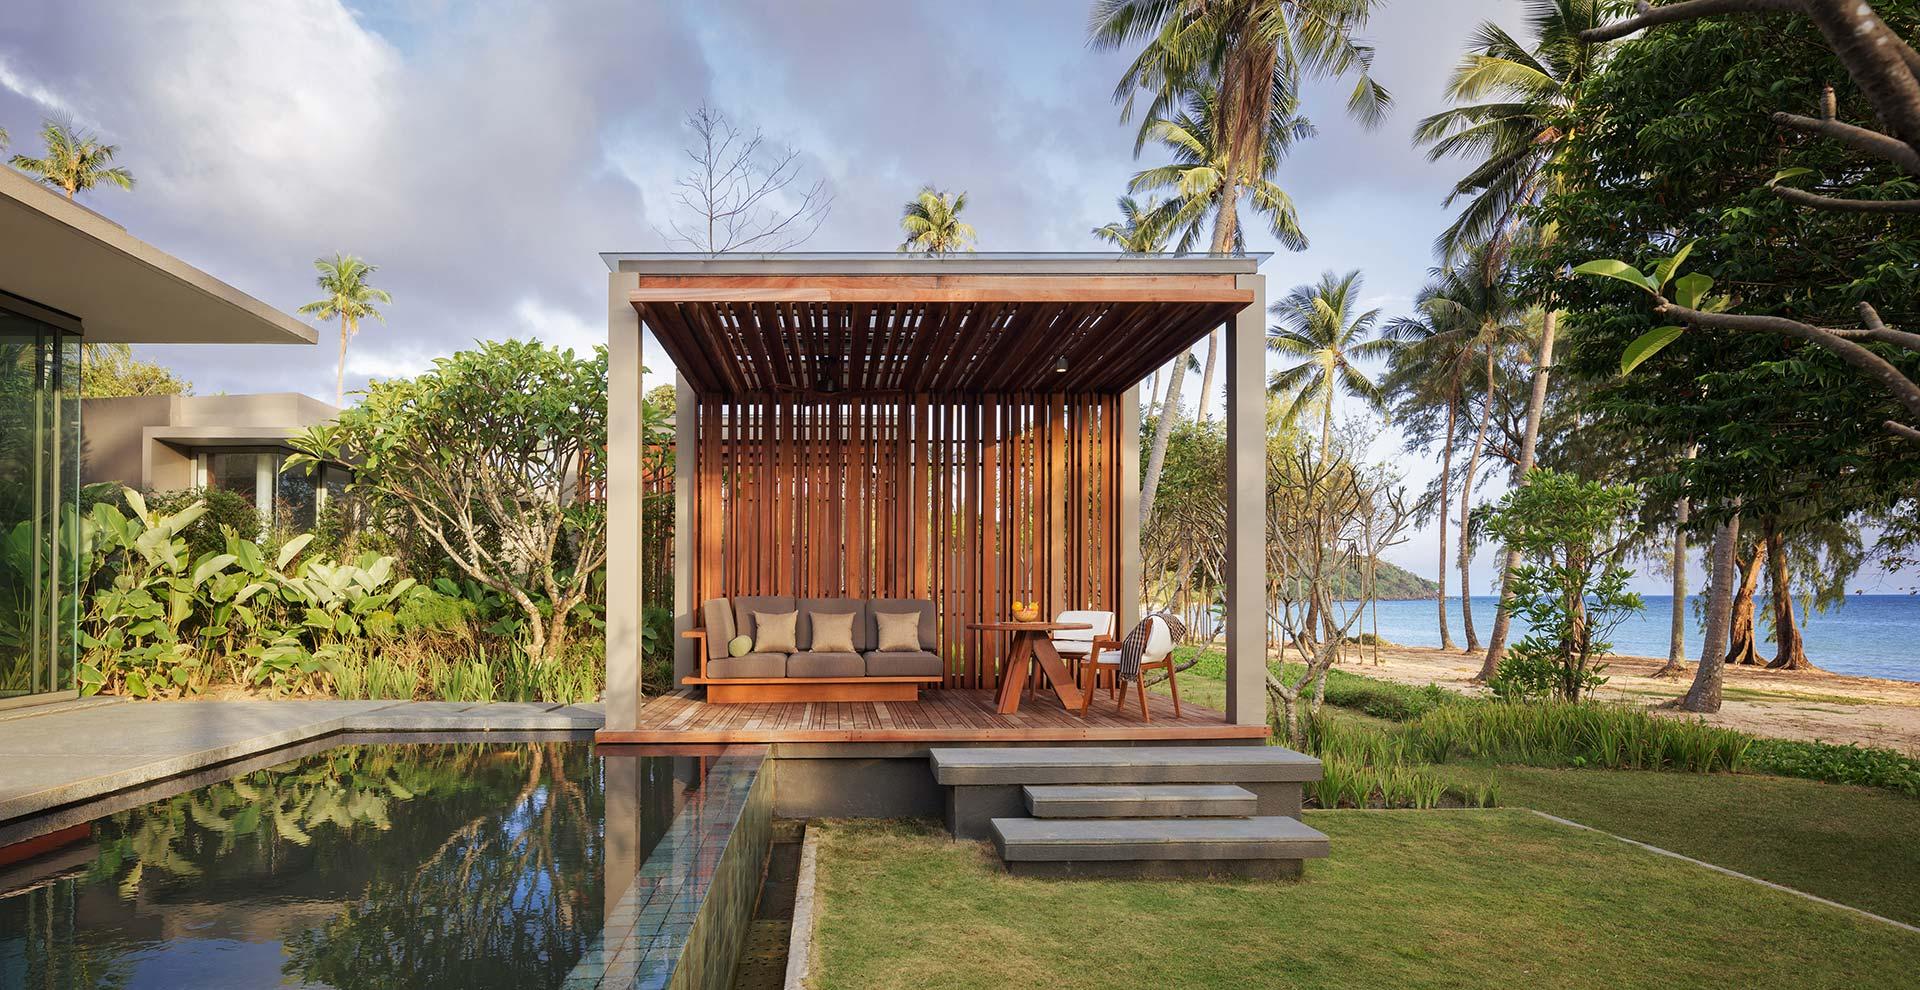 Alila koh russey-one-bedroom-villa-pool02